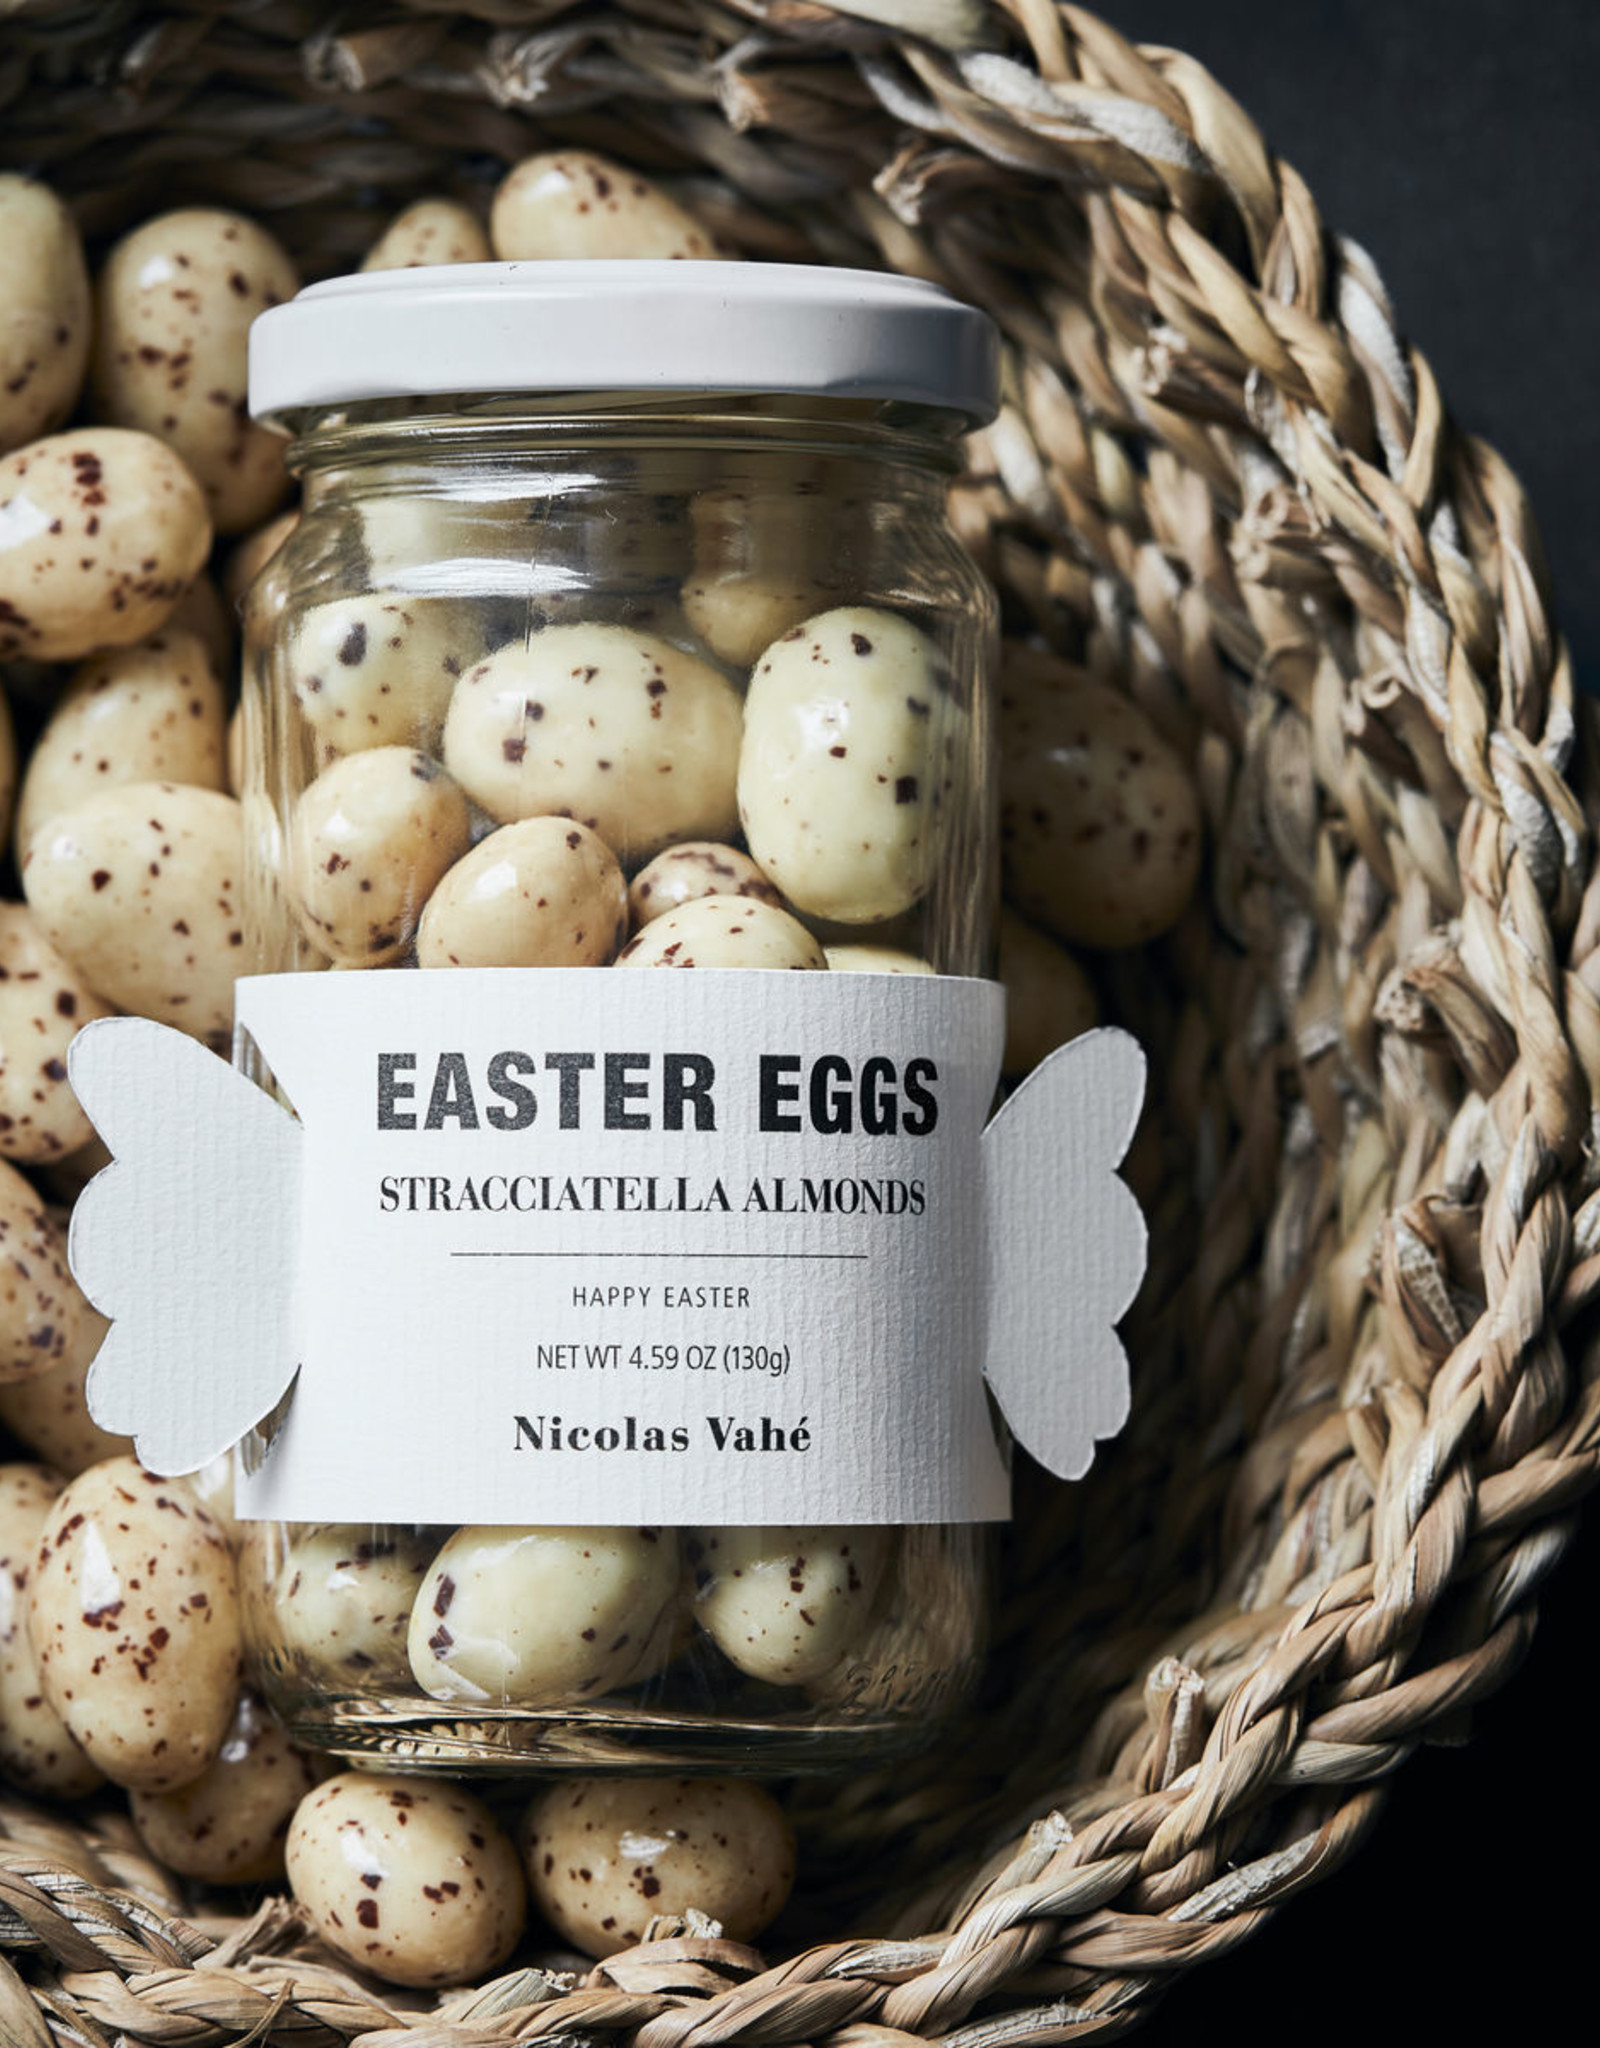 Nicolas Vahé Easter Eggs-straciatella almonds